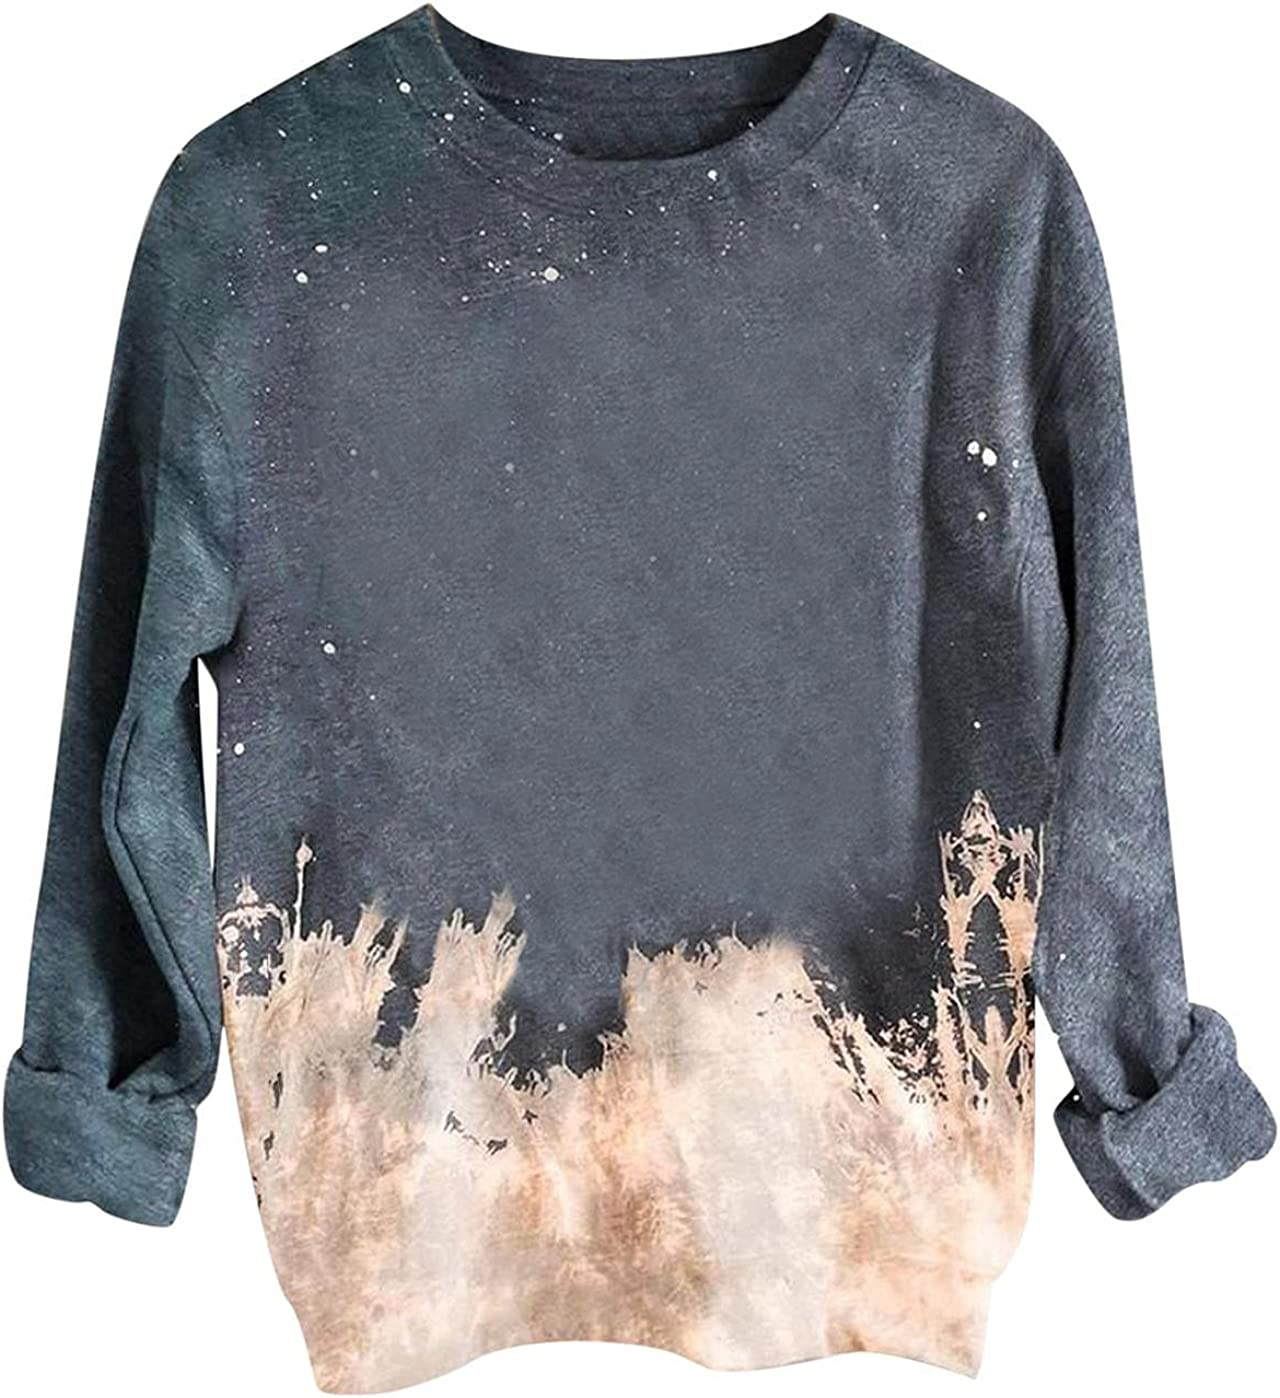 Halloween Brand new Sweatshirt for Women Shirts Tie Dye sale Reverse Tops Rainb